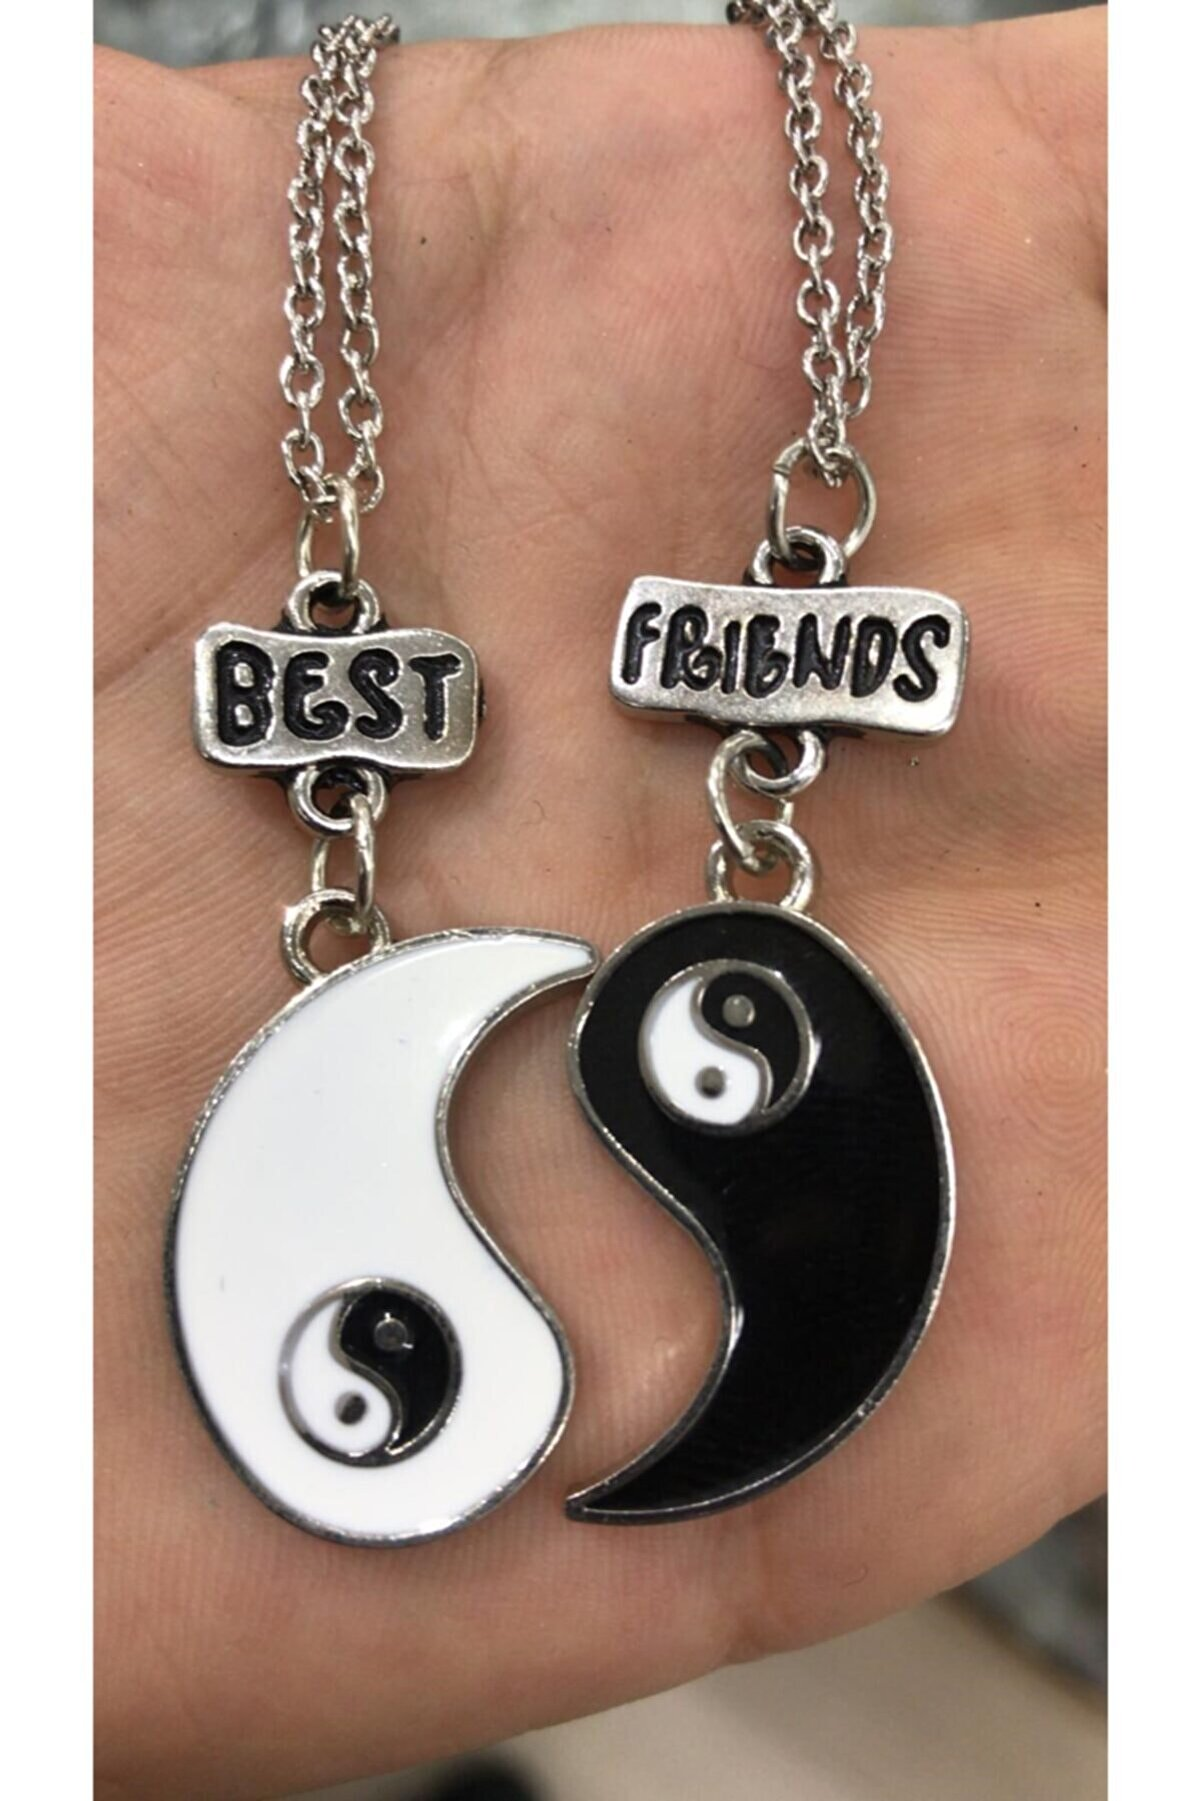 ema Ikili Ying Yang Best Friends Yazılı Bff Kolye Aksesuar Şık Süs Takı